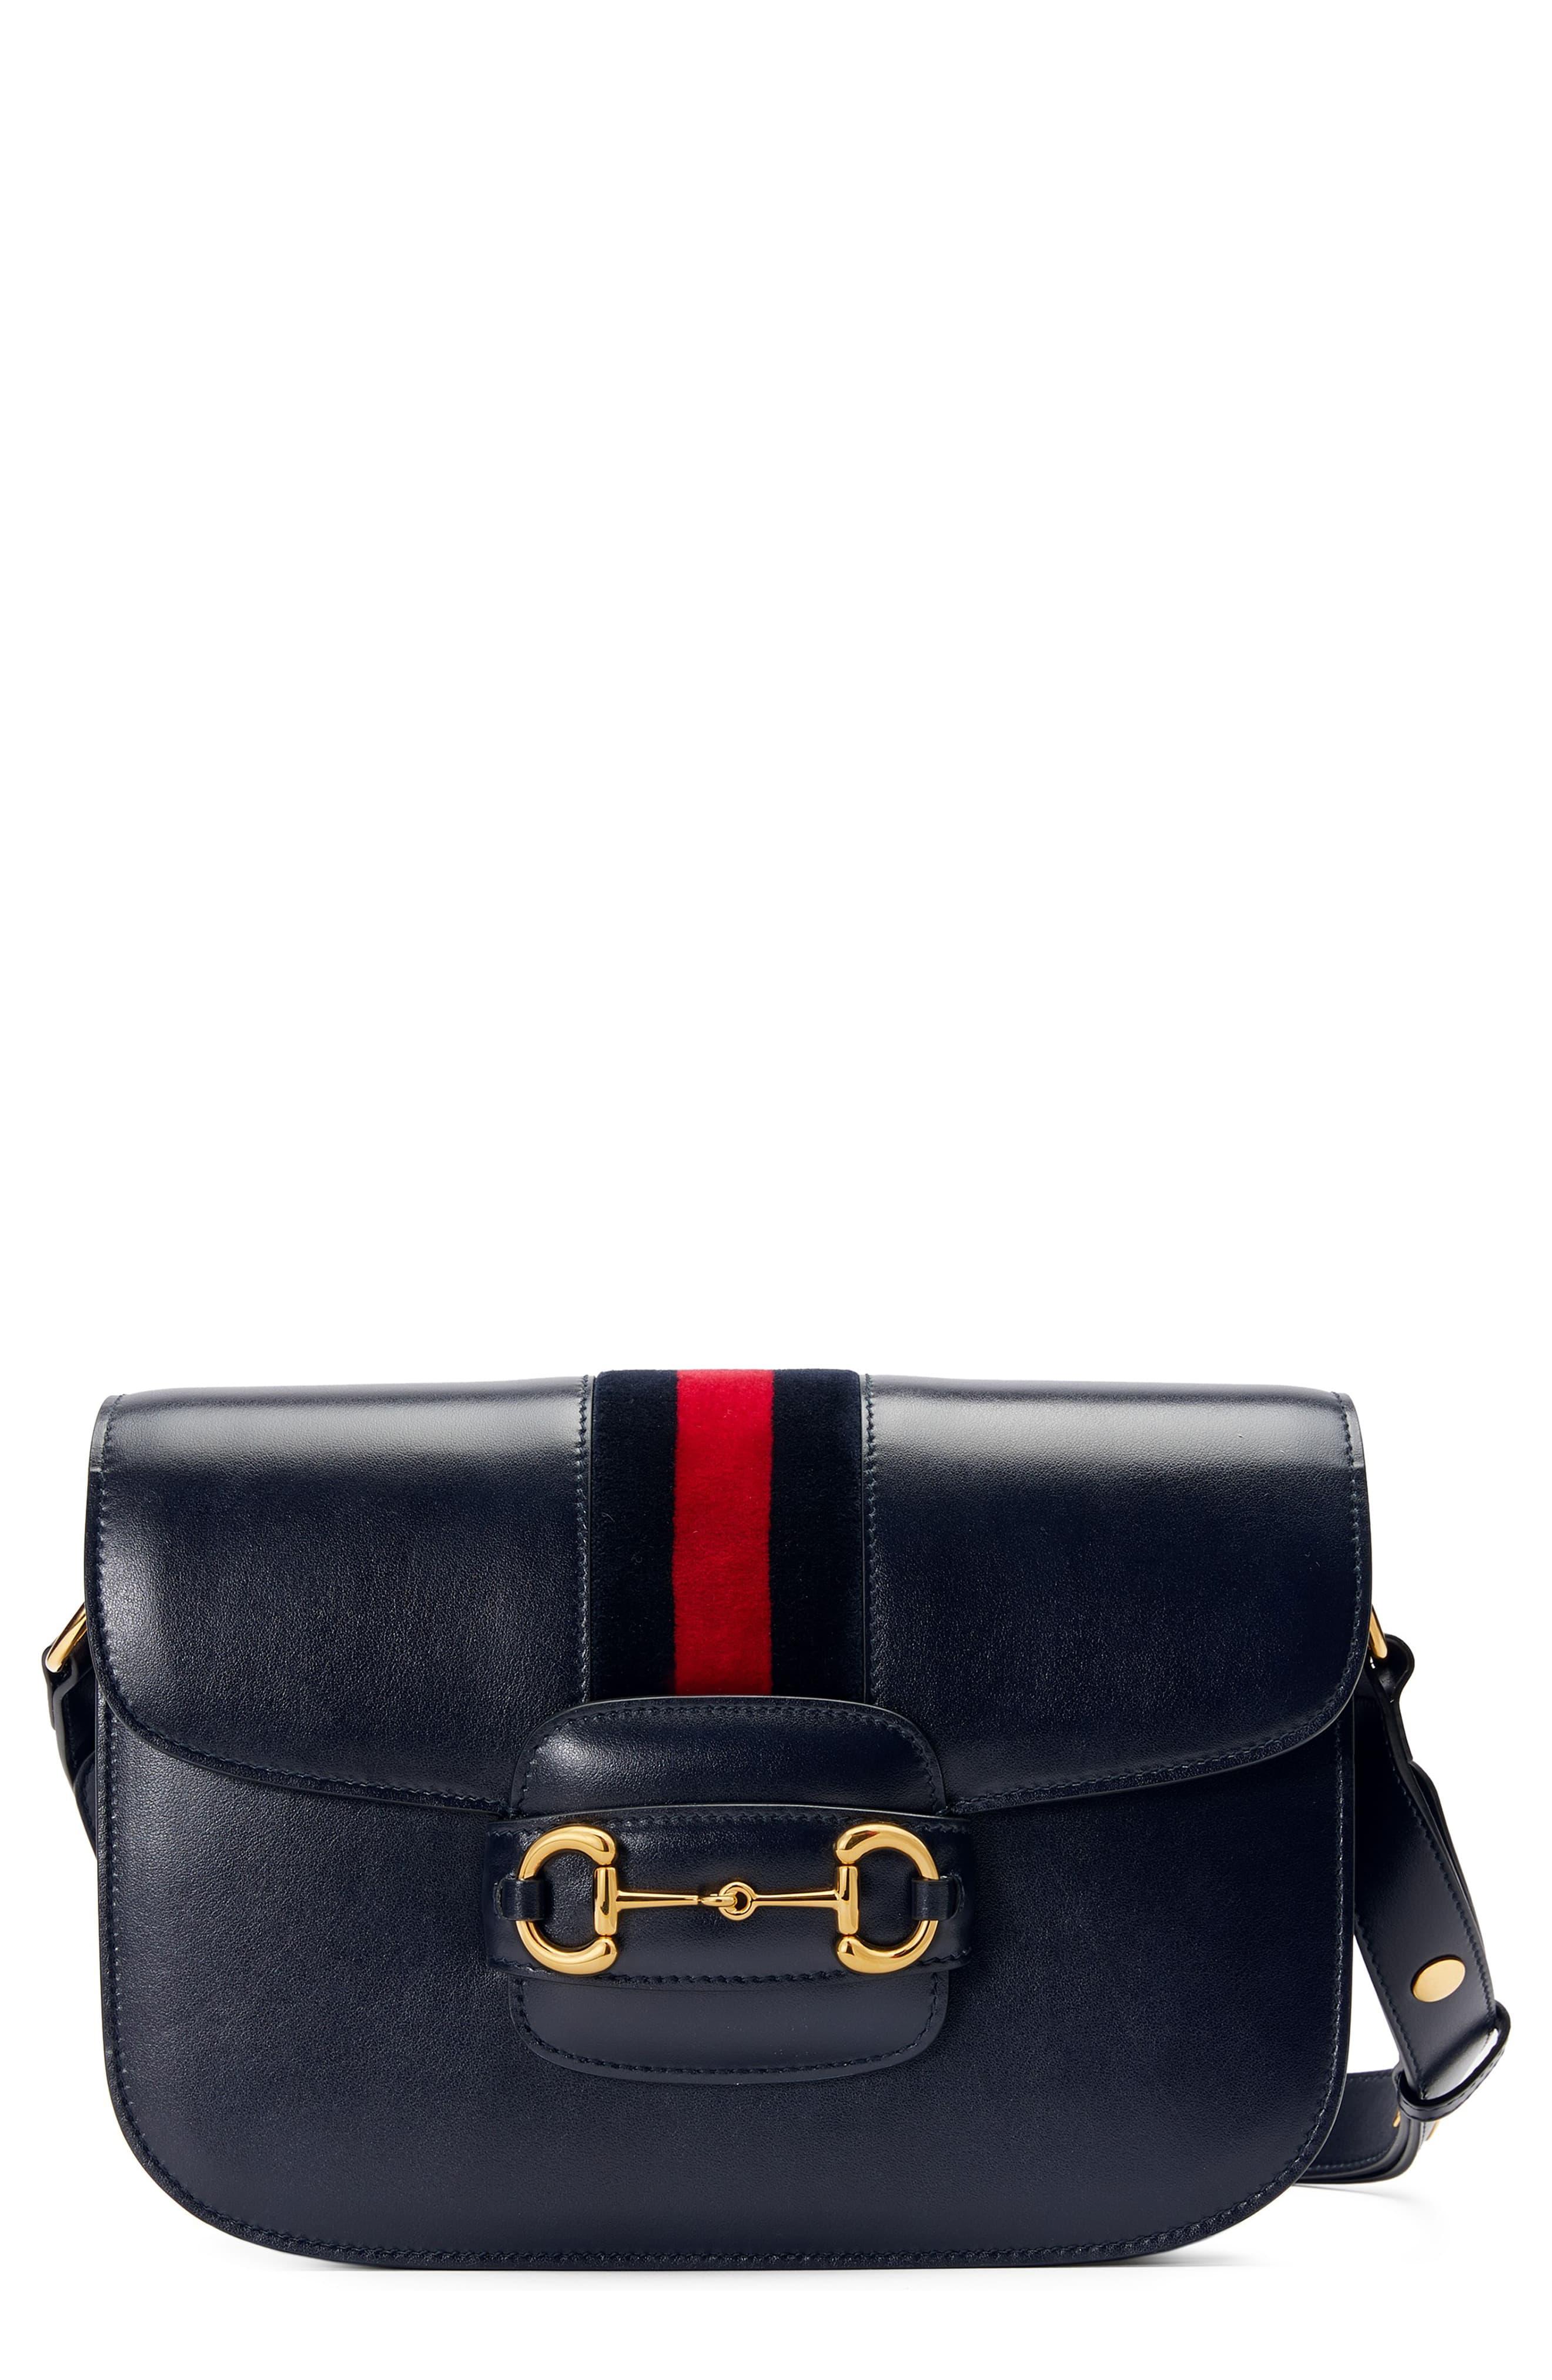 GUCCI Small 1955 Horsebit Leather Shoulder Bag, Main, color, BLU/ BLUE RED